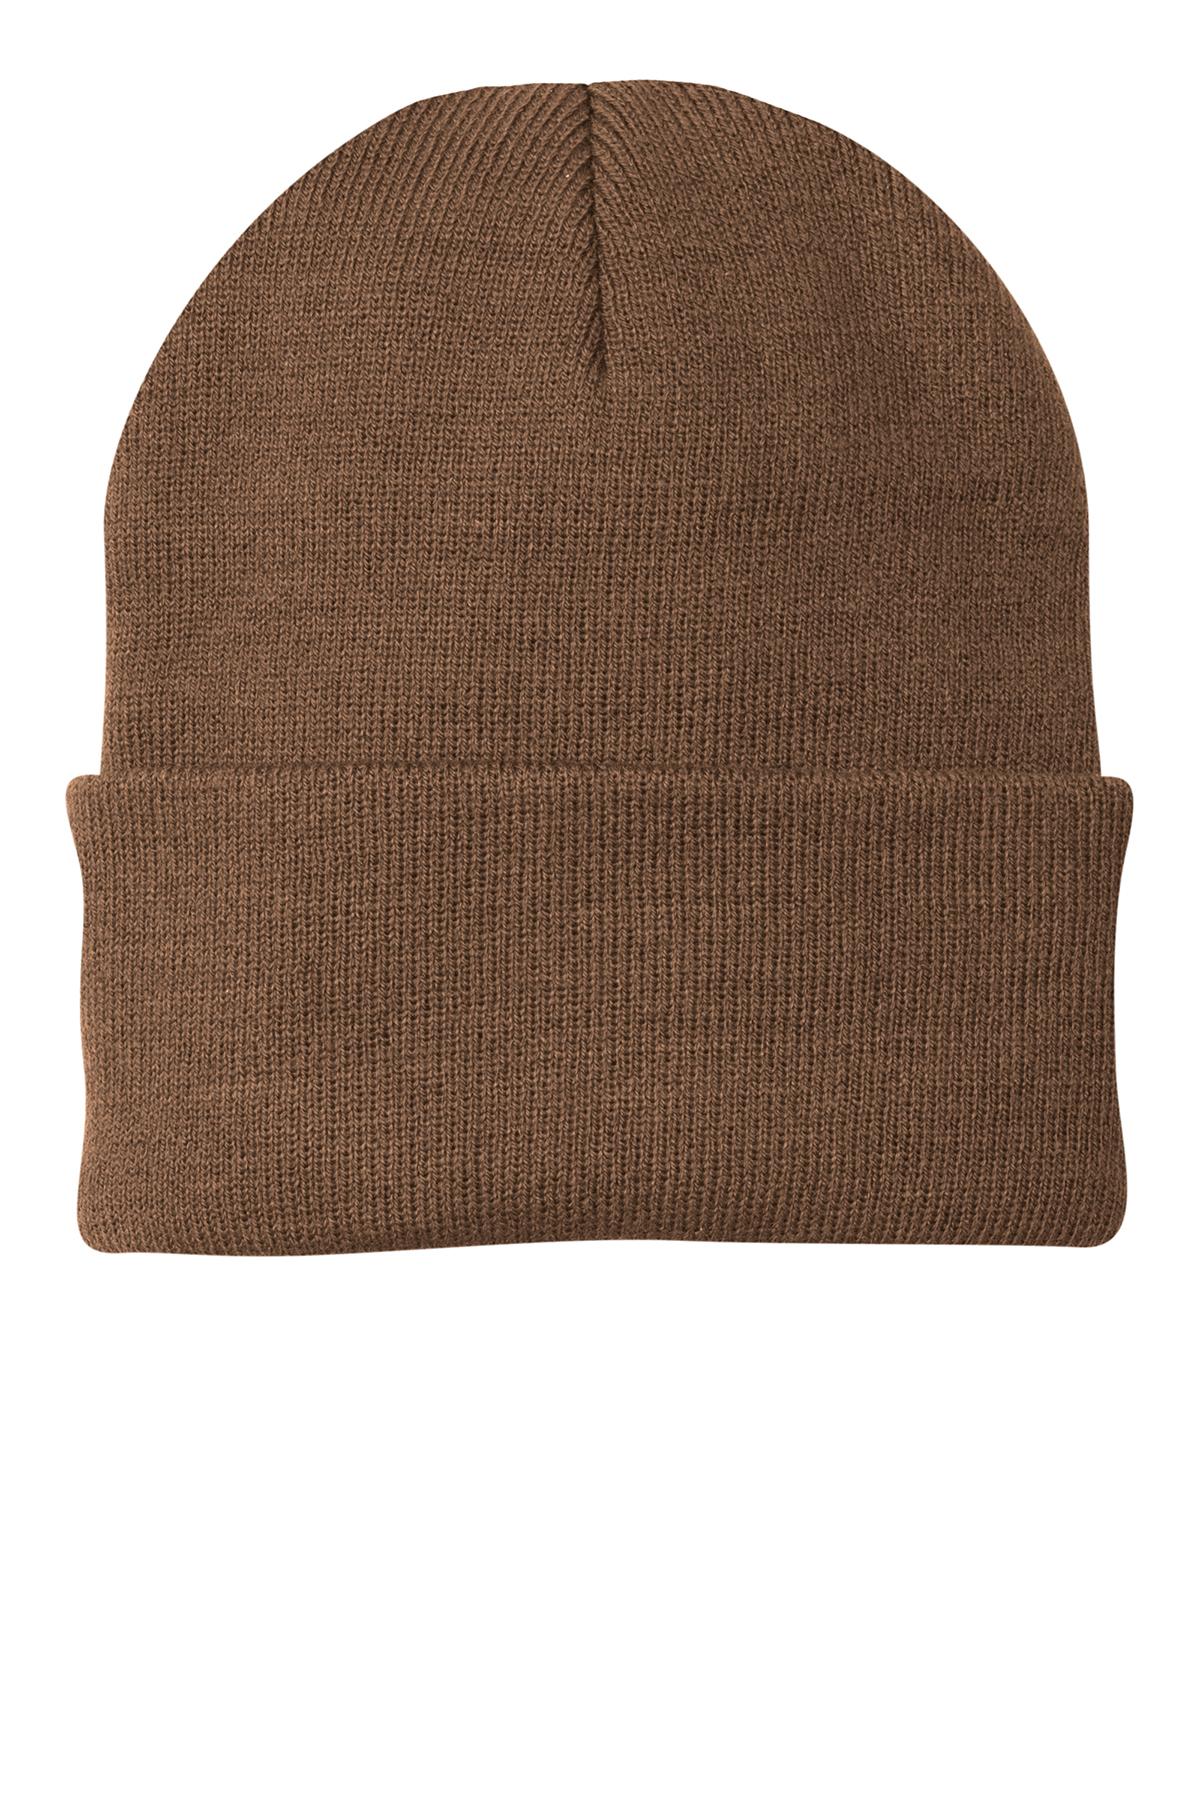 Port   Company® - Knit Cap  1e517ac0a09